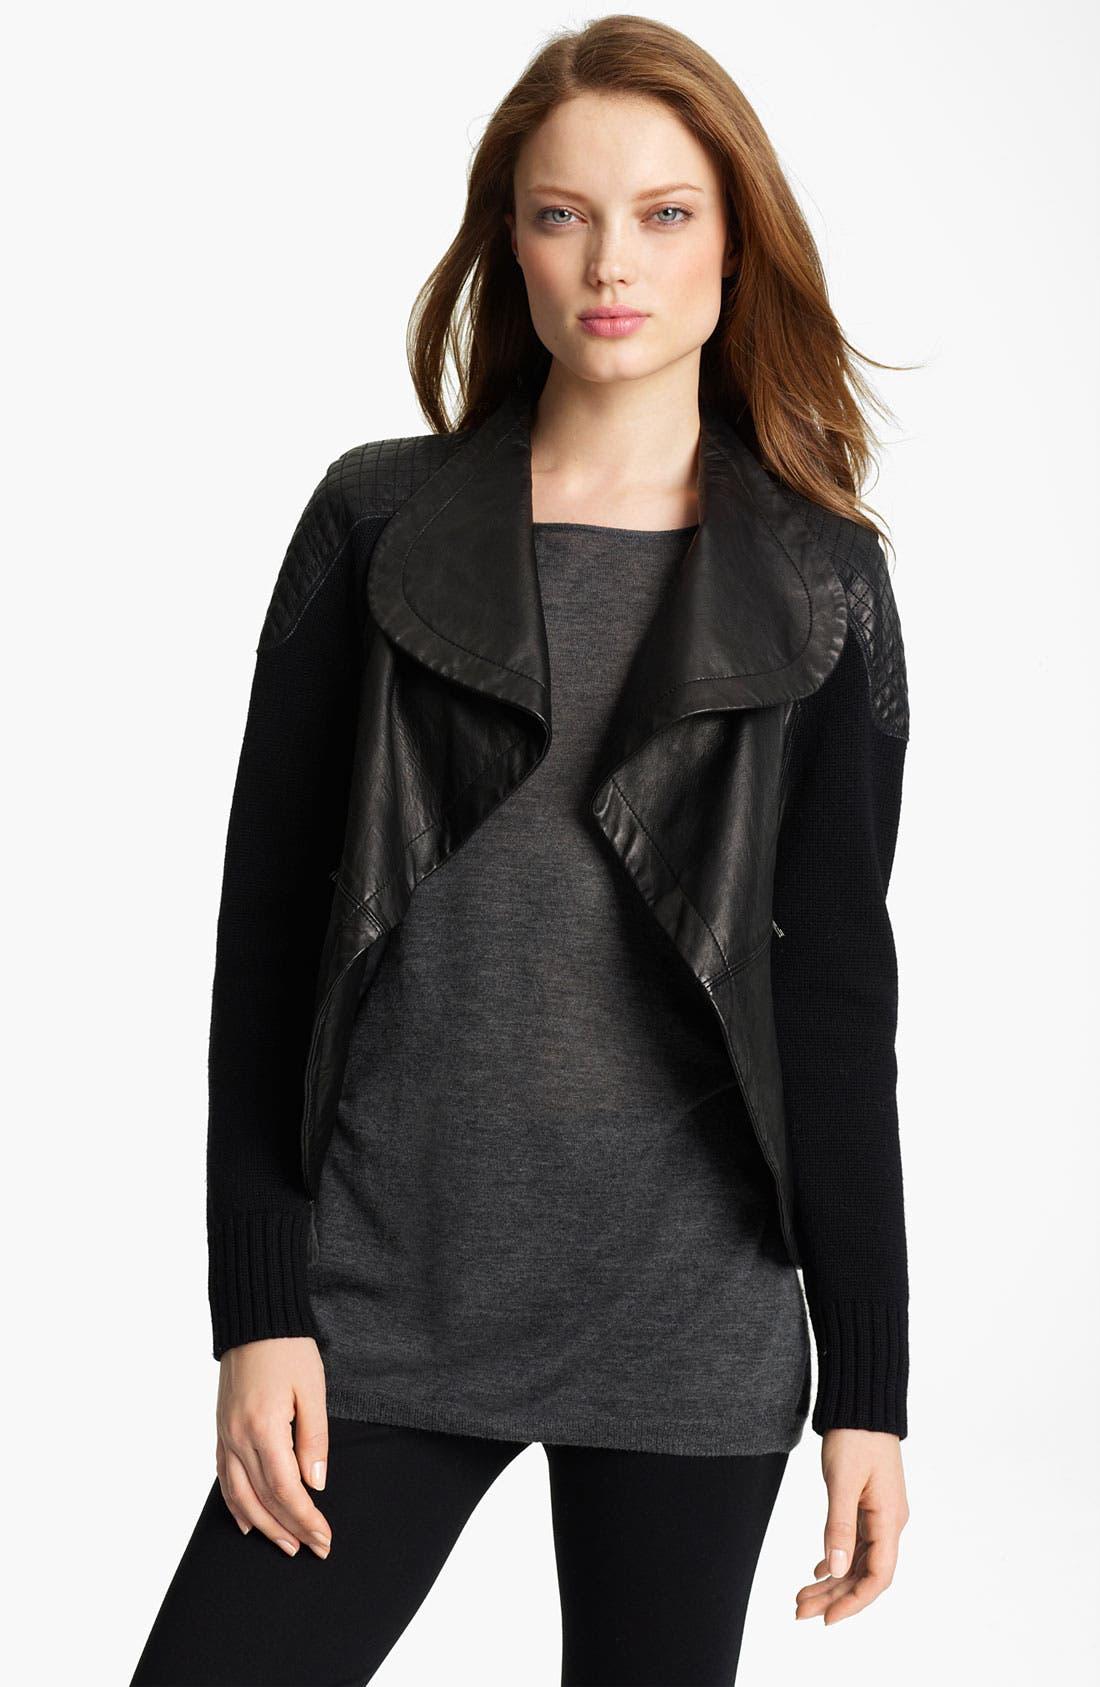 Main Image - Yigal Azrouël Drape Front Leather & Knit Jacket